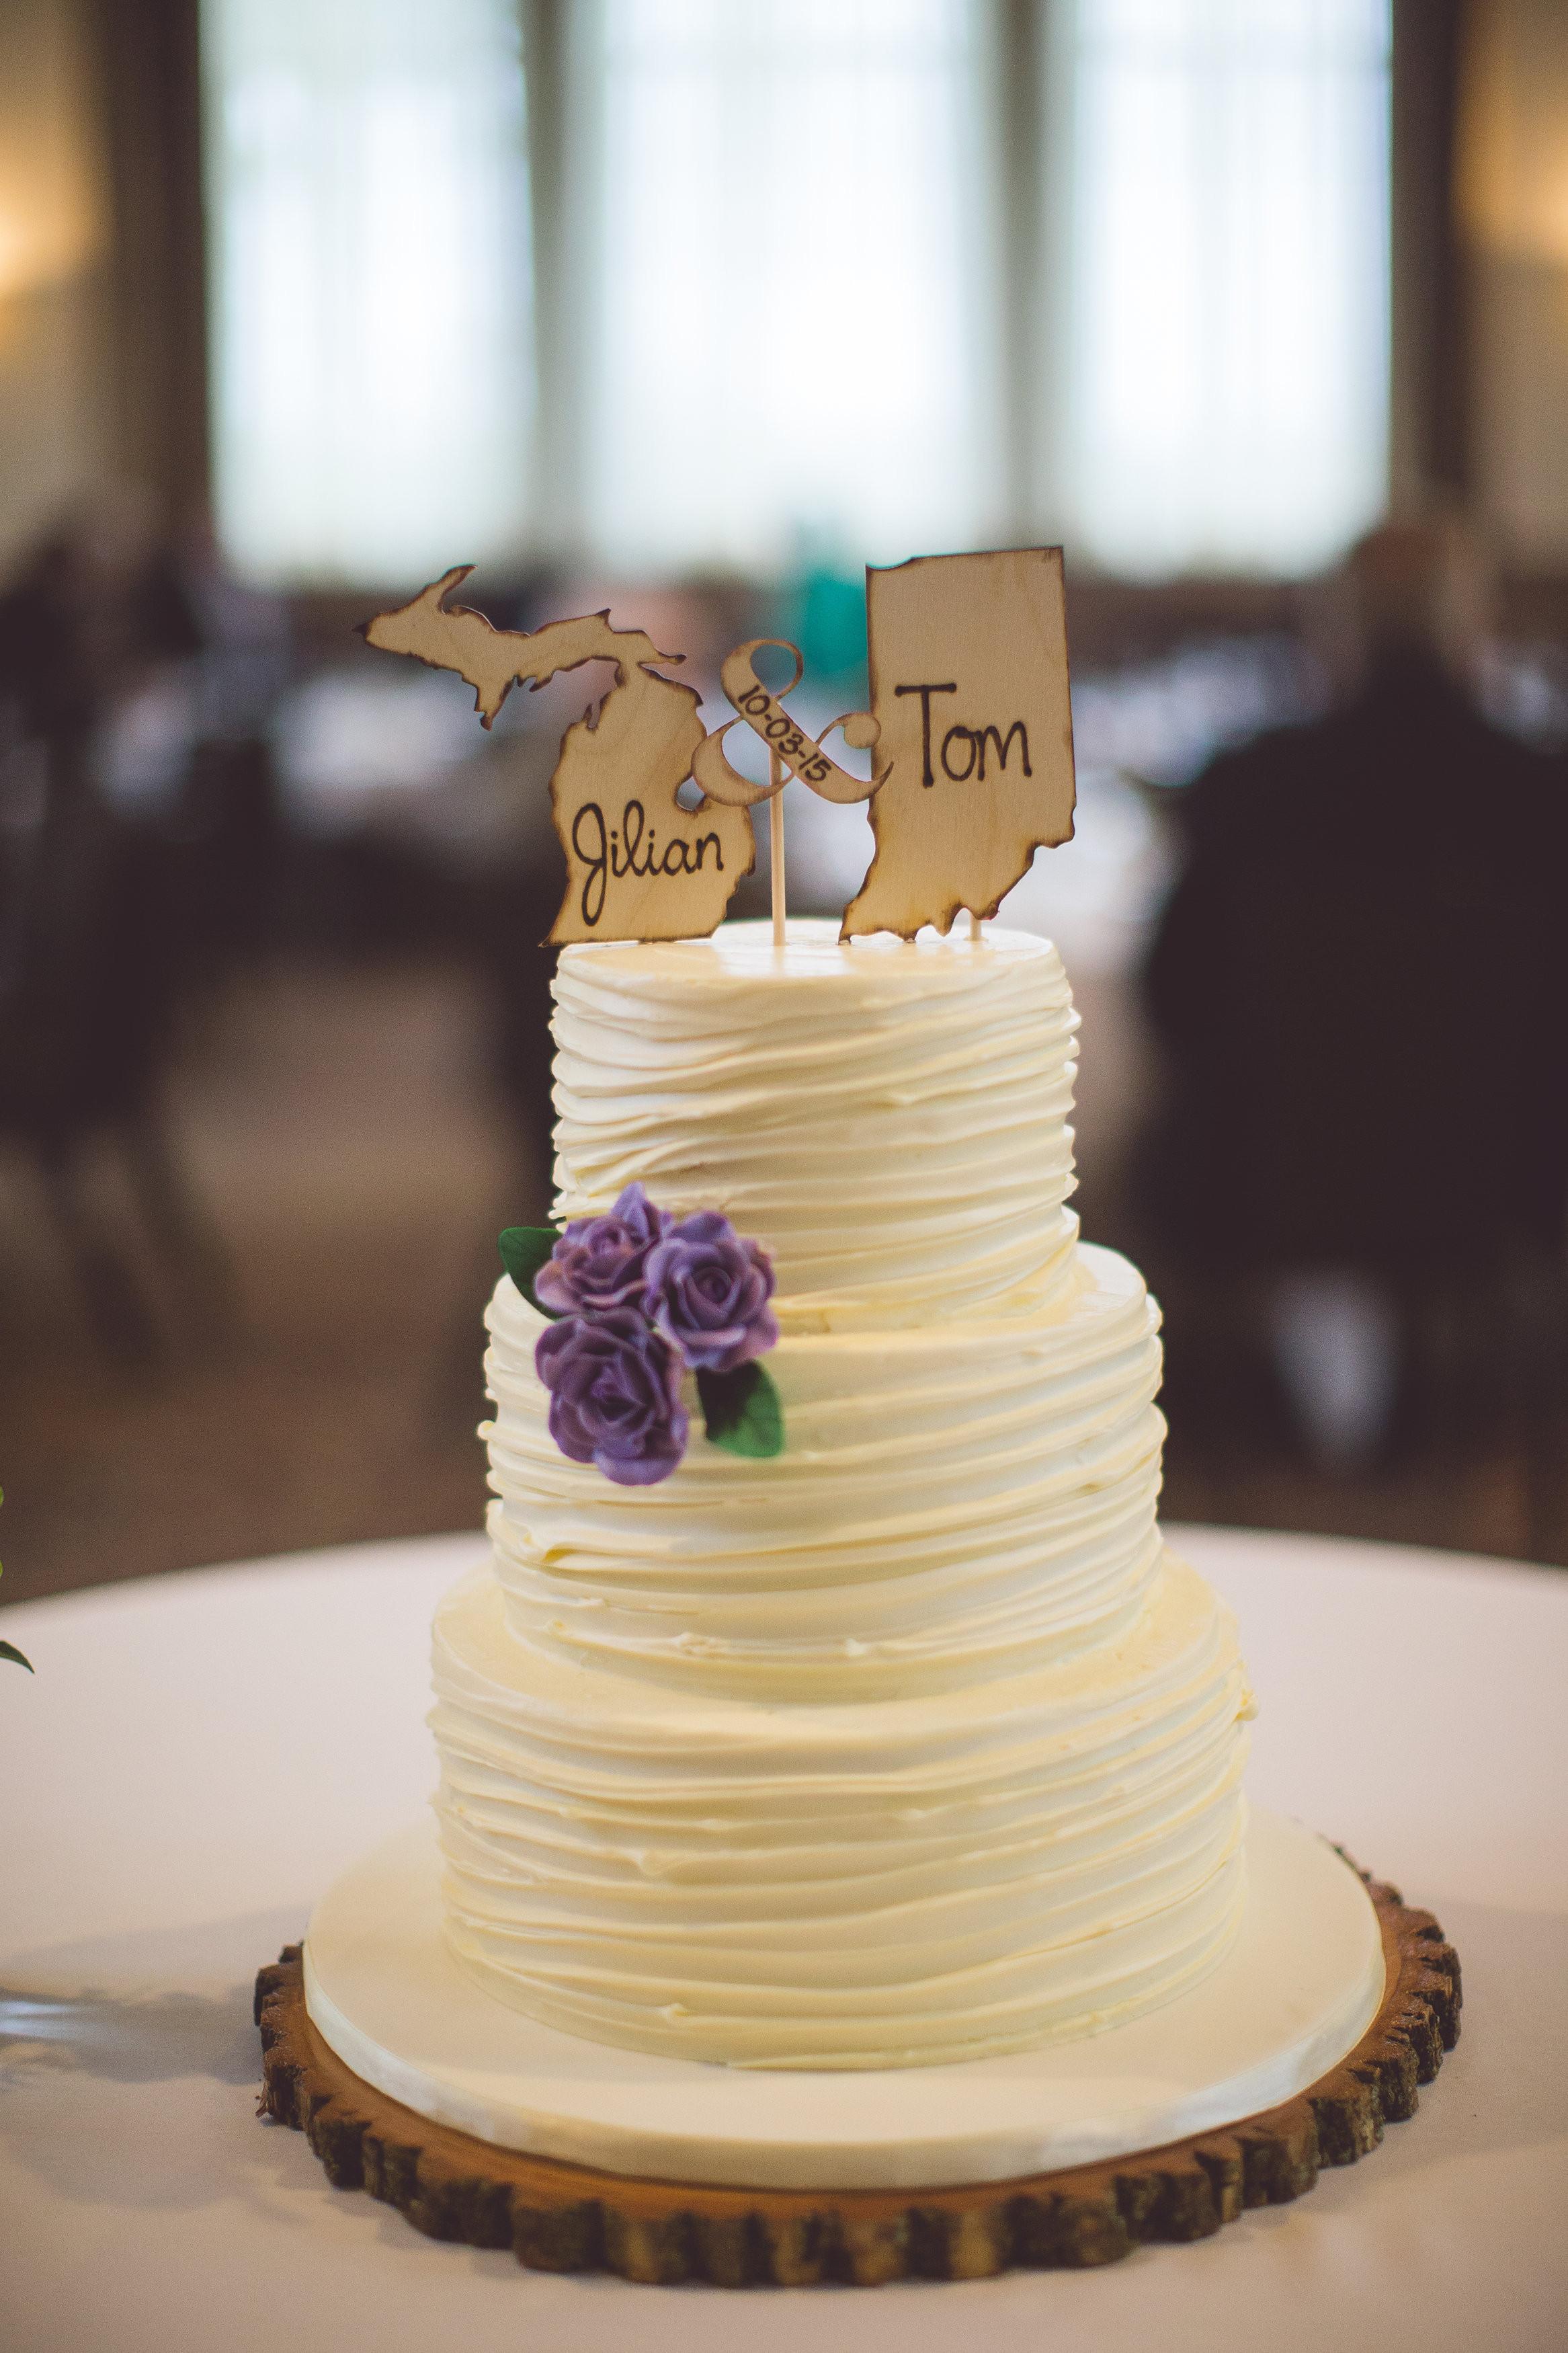 Wedding Cakes Pics  Zingerman s Wedding Cakes Zingerman s Bakehouse